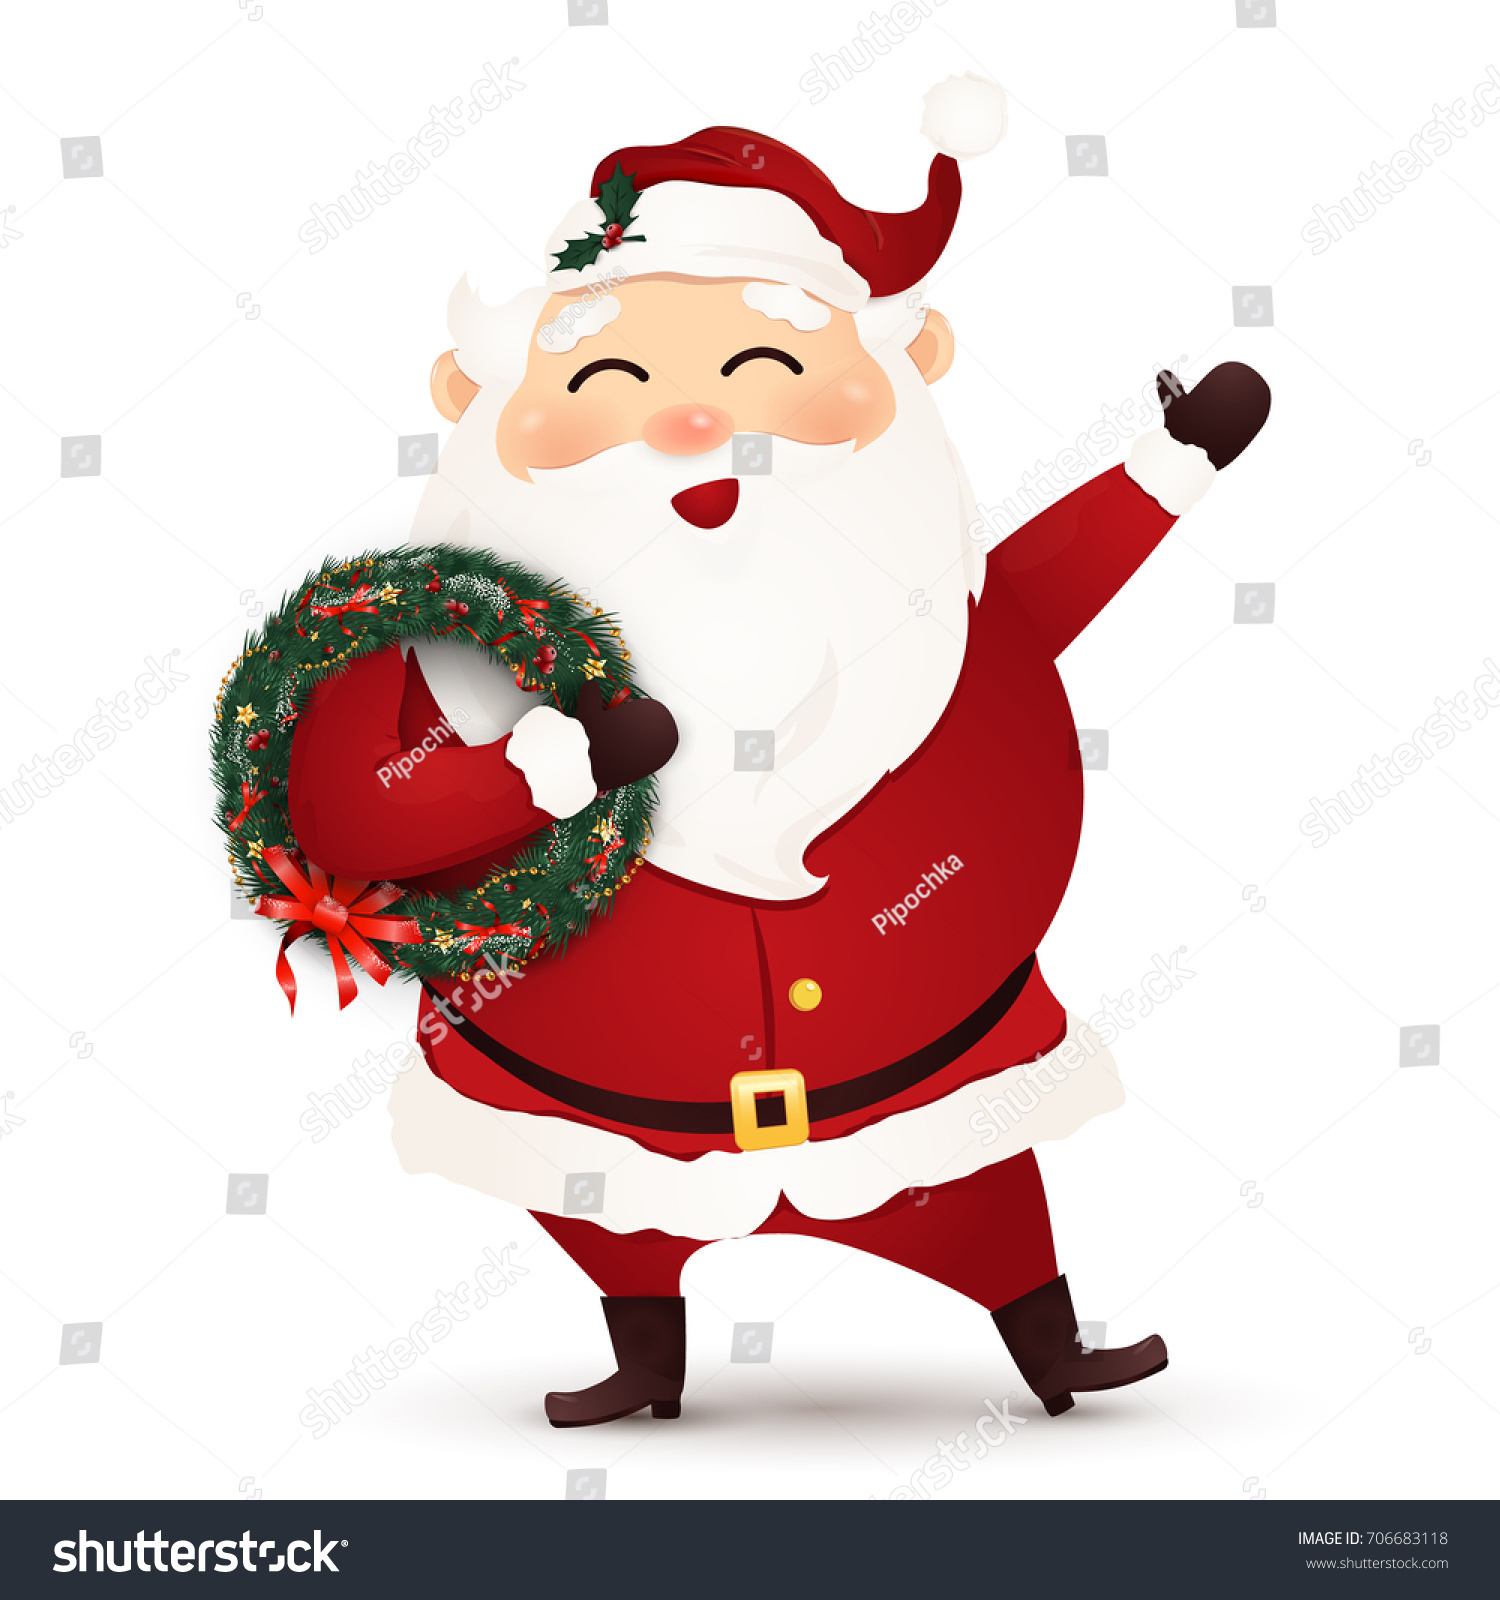 merry christmas christmas cute happy funny stock illustration